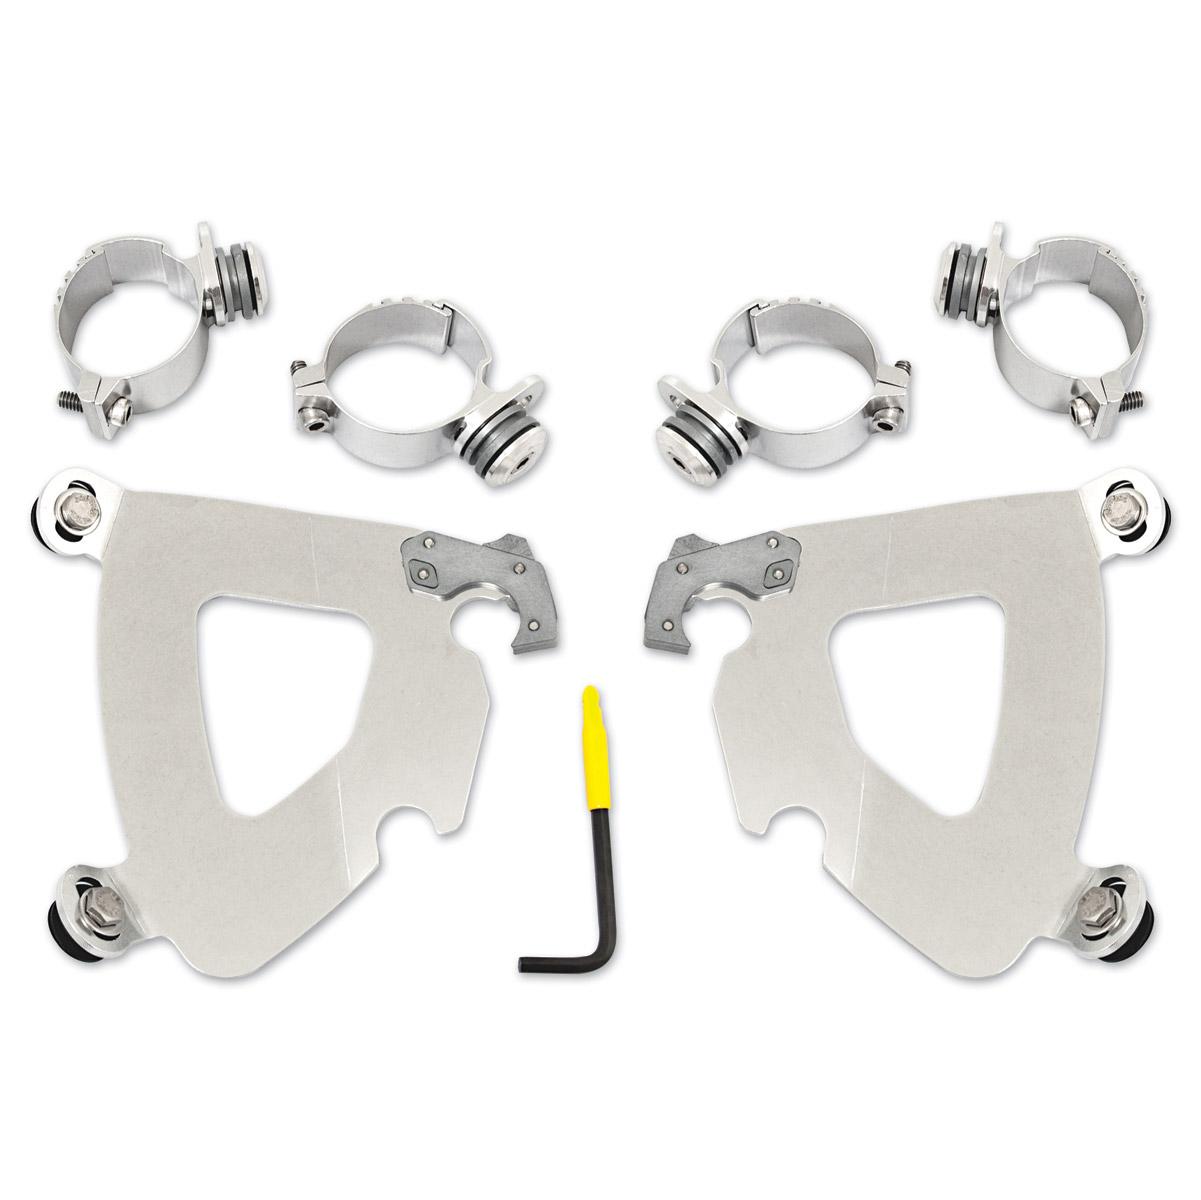 Memphis Shades Gauntlet Fairing Polished Trigger Lock Mount Kit